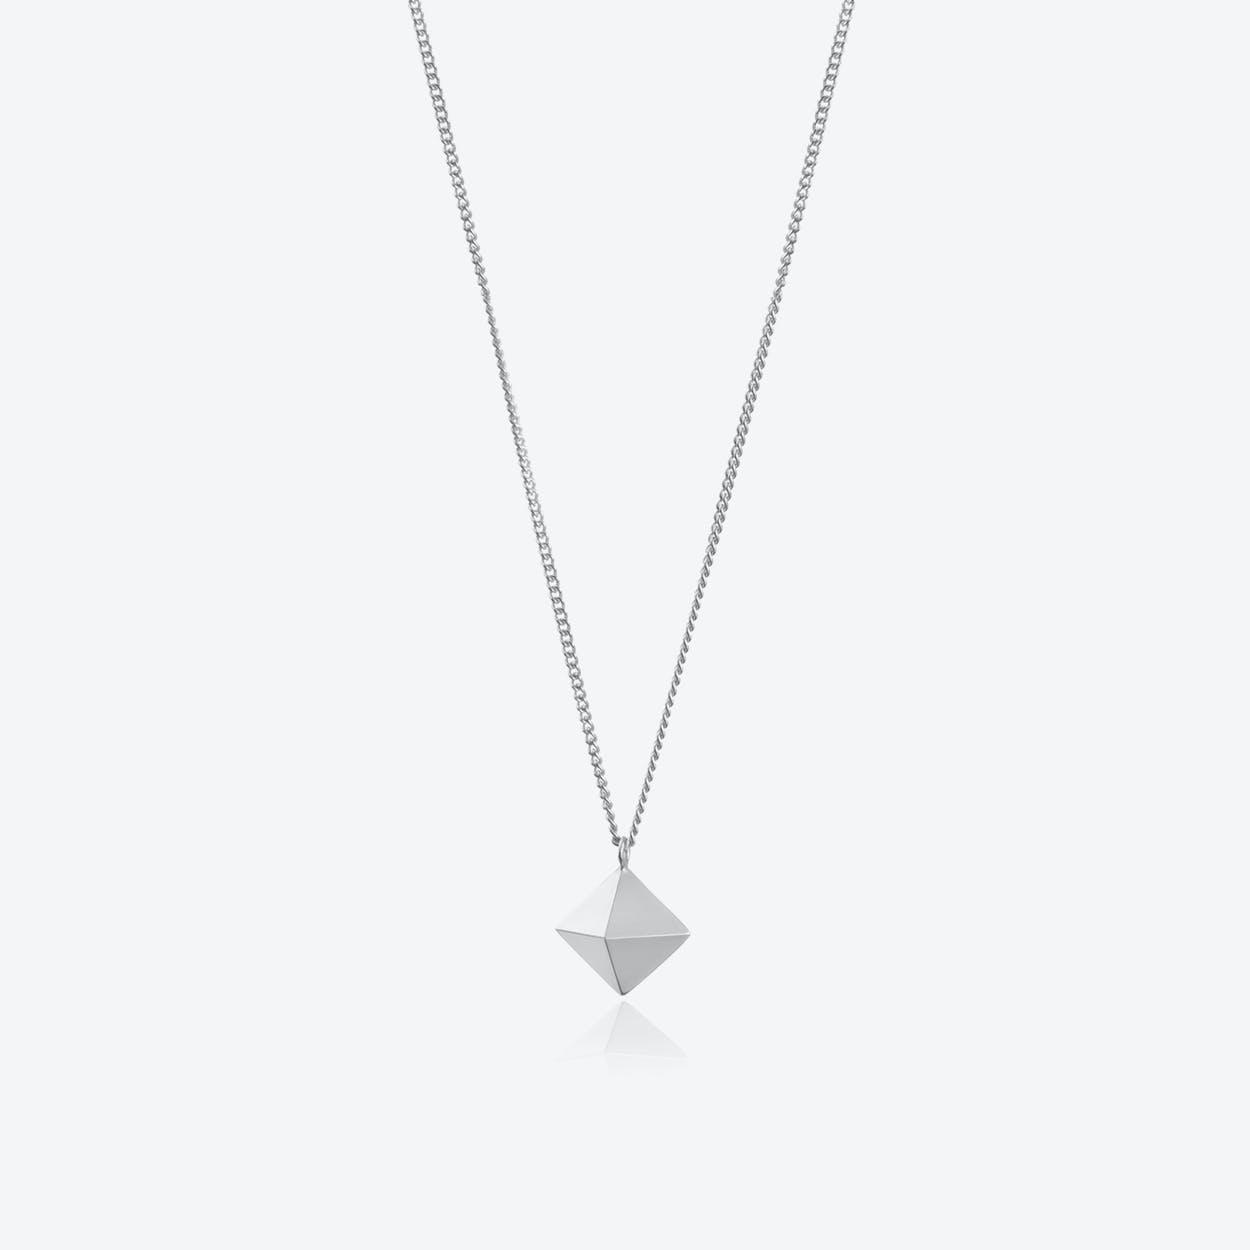 Octahedron Pendant in Silver